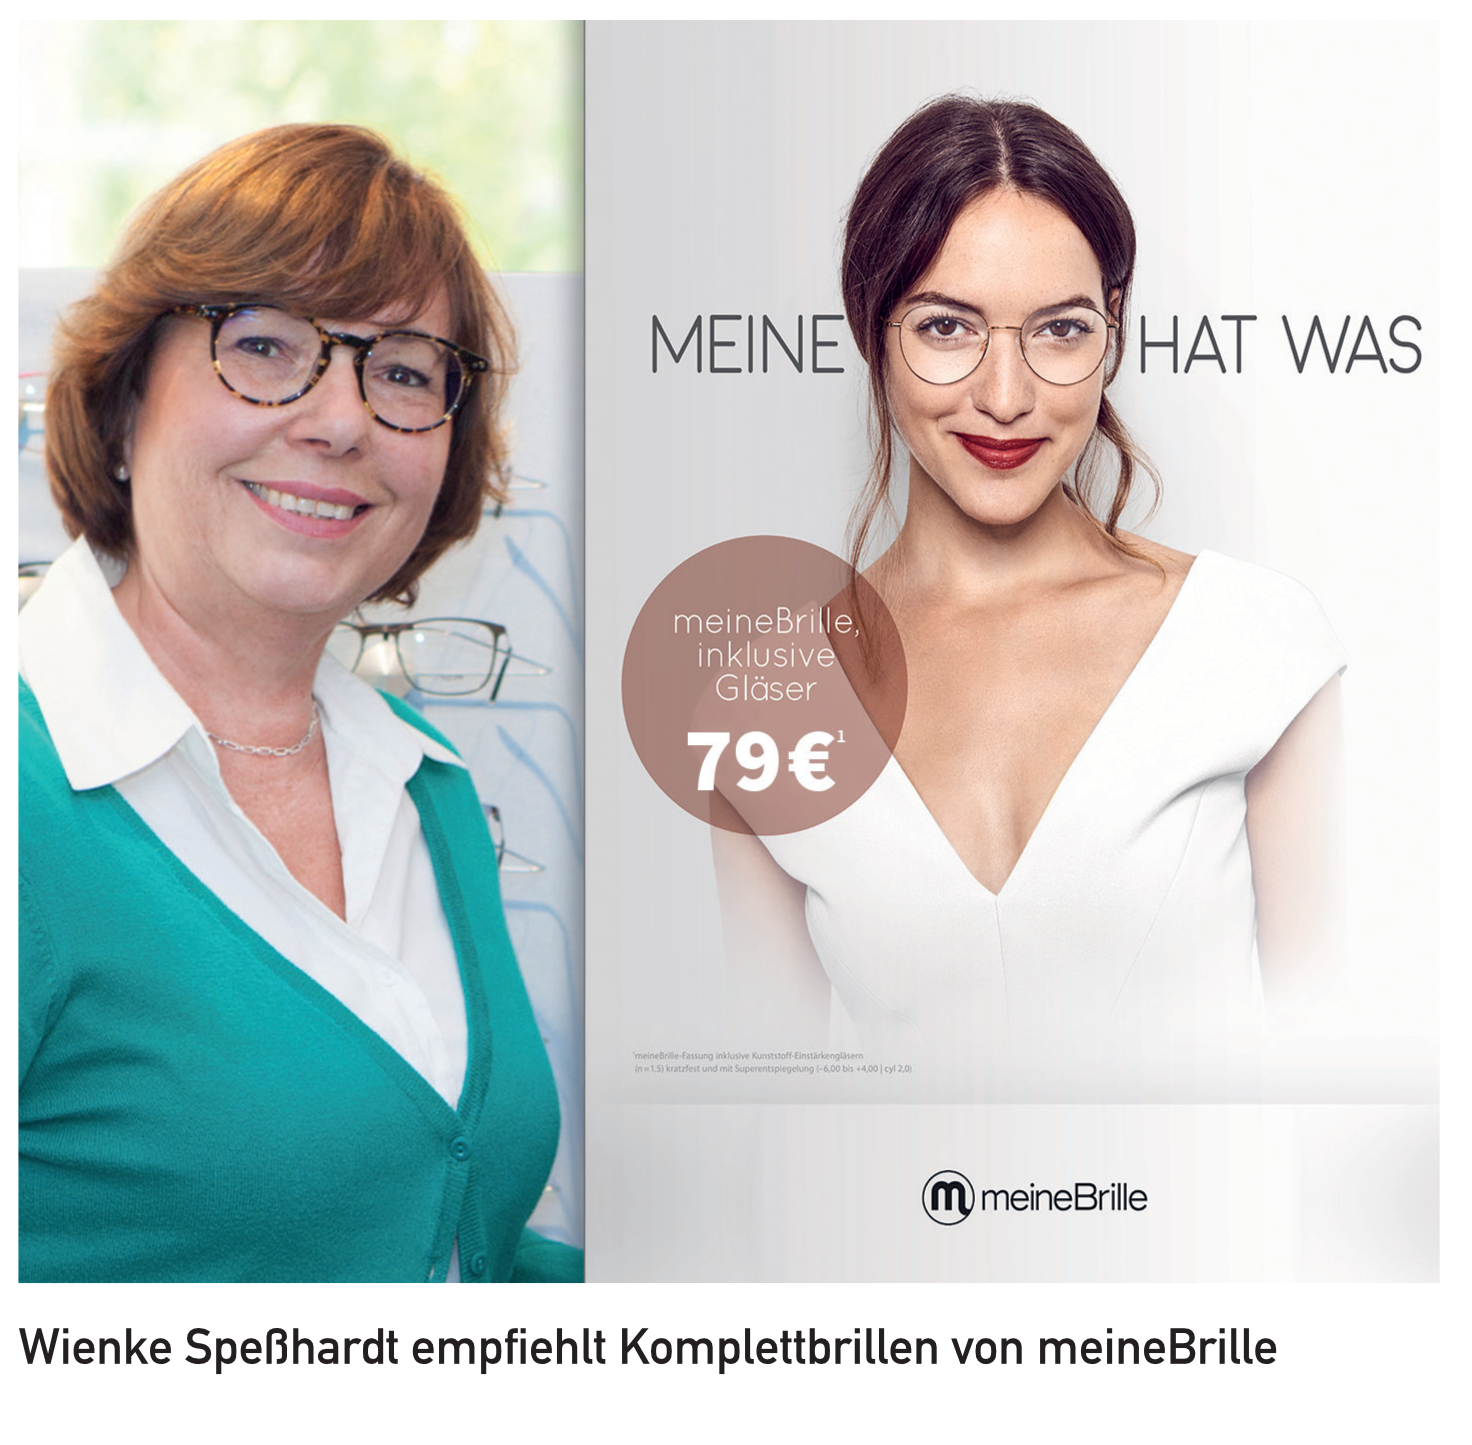 Landkreis Express Ausgabe Ludwigslust vom 02. Sep. 2020